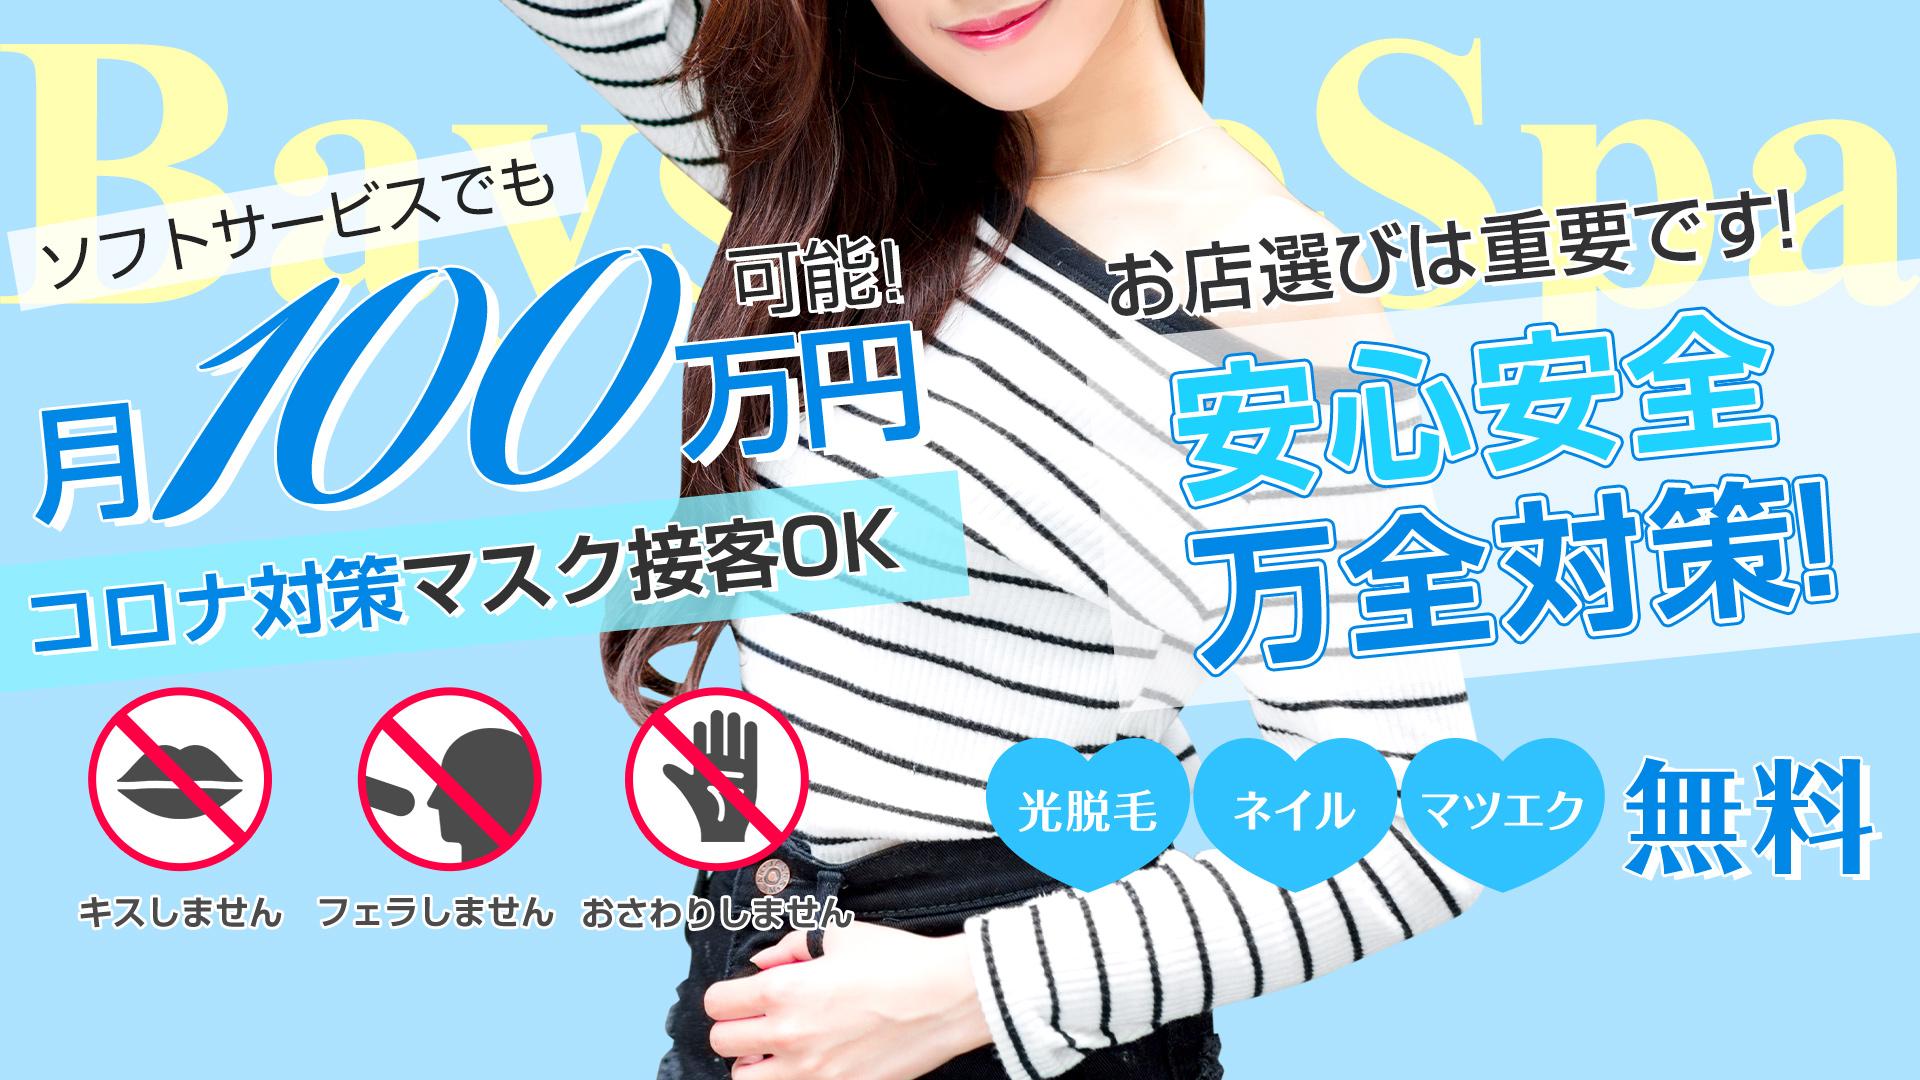 BaysideSpa神戸三宮店の求人画像